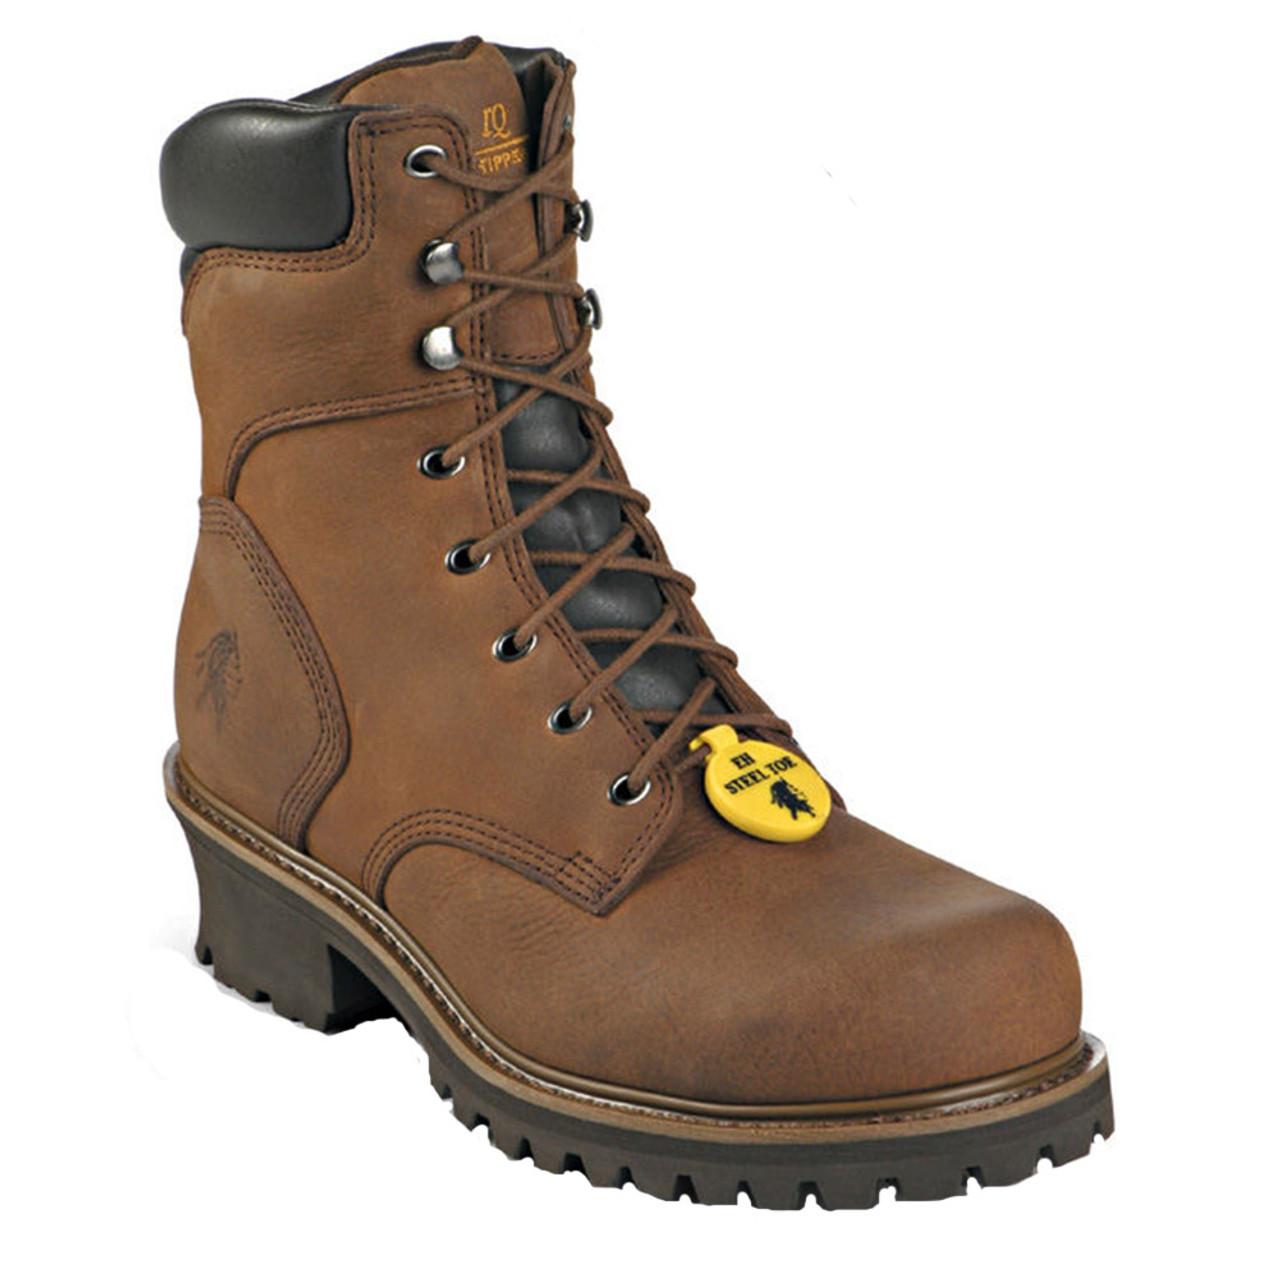 ec14c7b0549 Chippewa 55025 HADOR HEAVY DUTY Steel Toe 400g Insulated Logger Boots